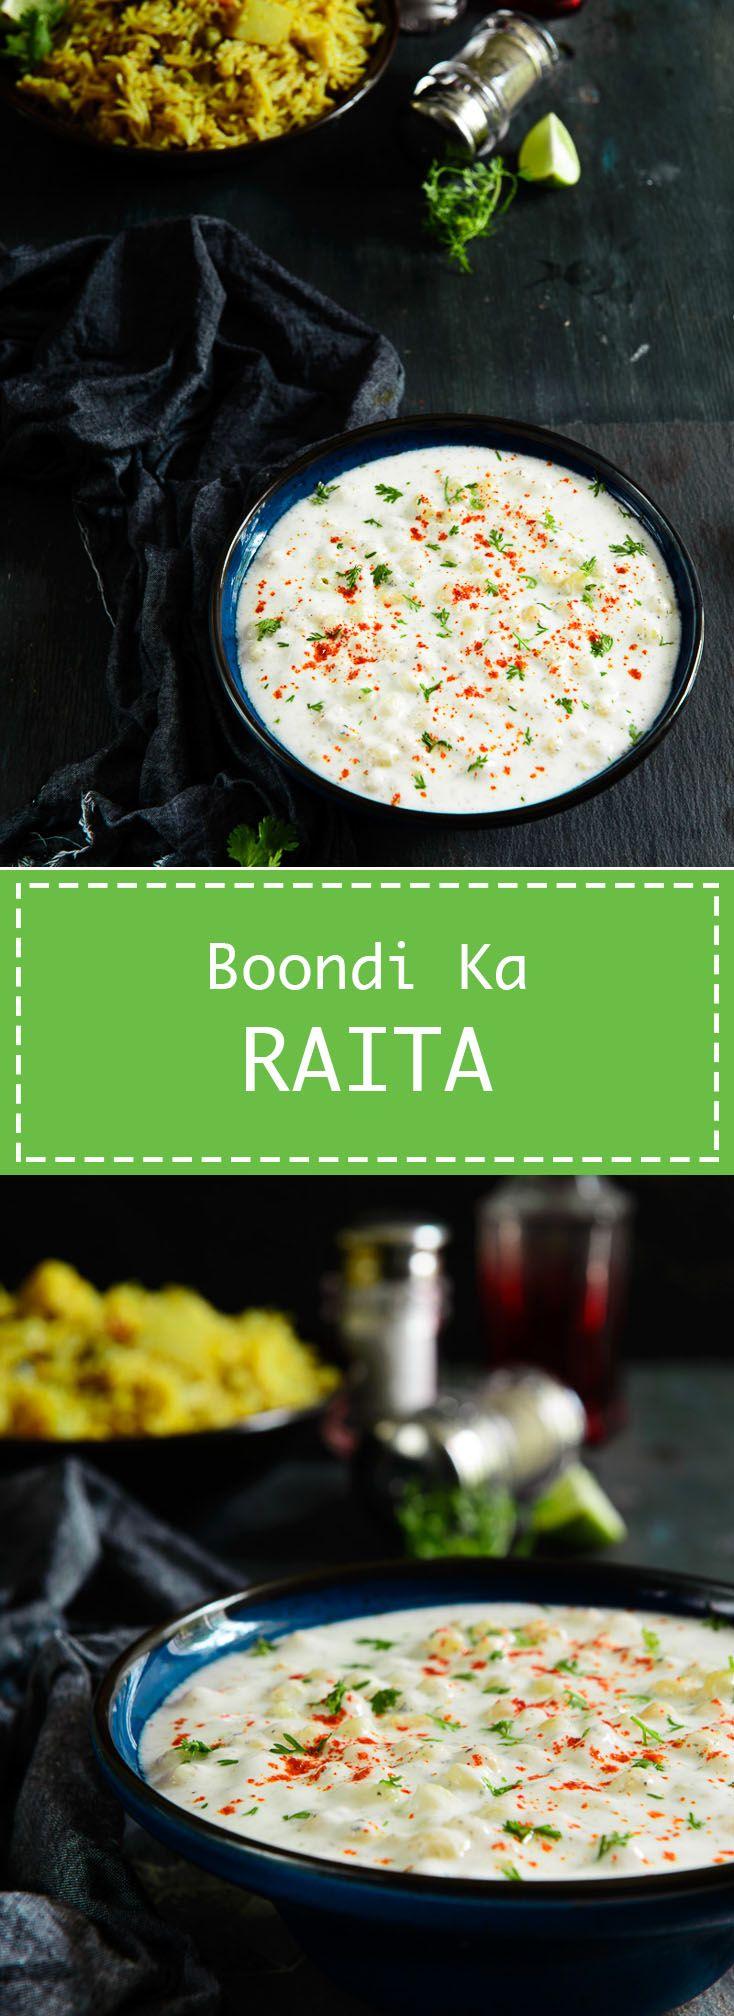 Boondi Ka Raita A simple and delicious accompaniment to enjoy with Indian food. #recipe #Indian #Raita